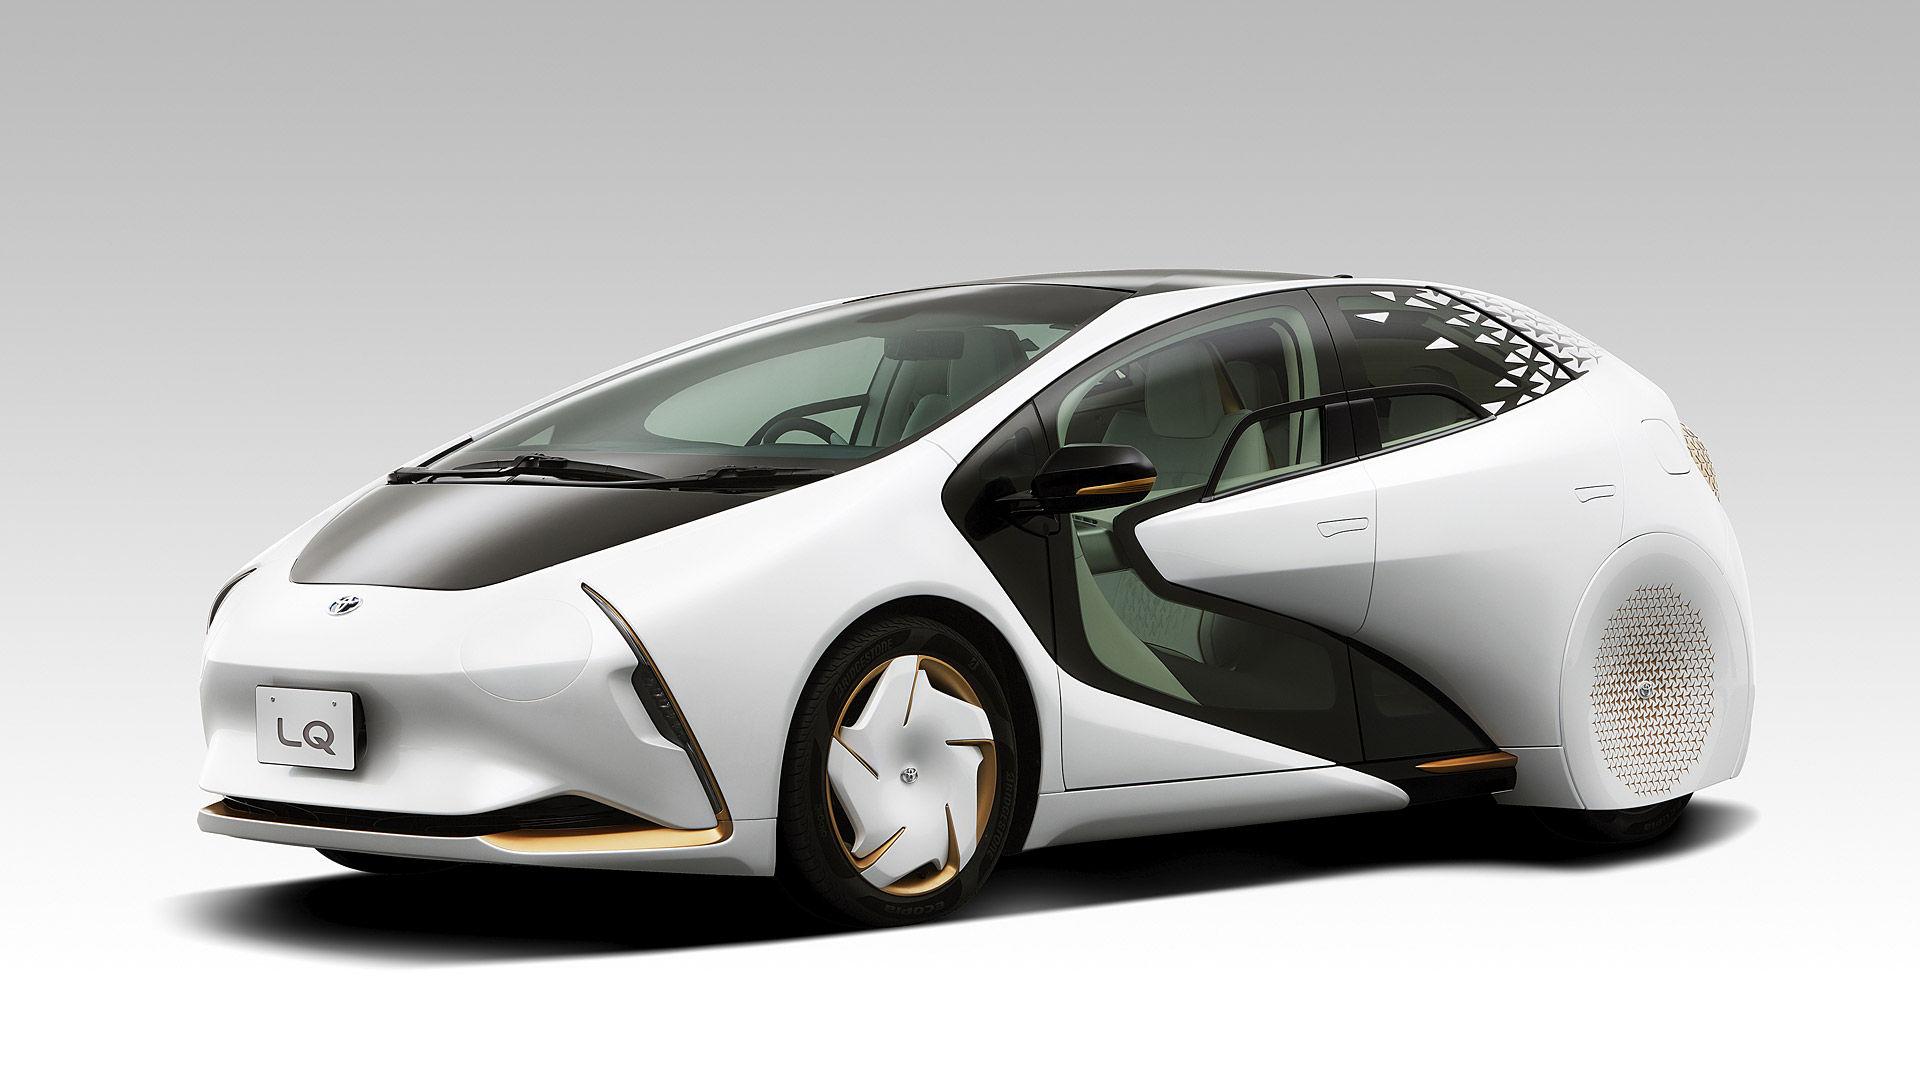 2019 Toyota LQ Concept